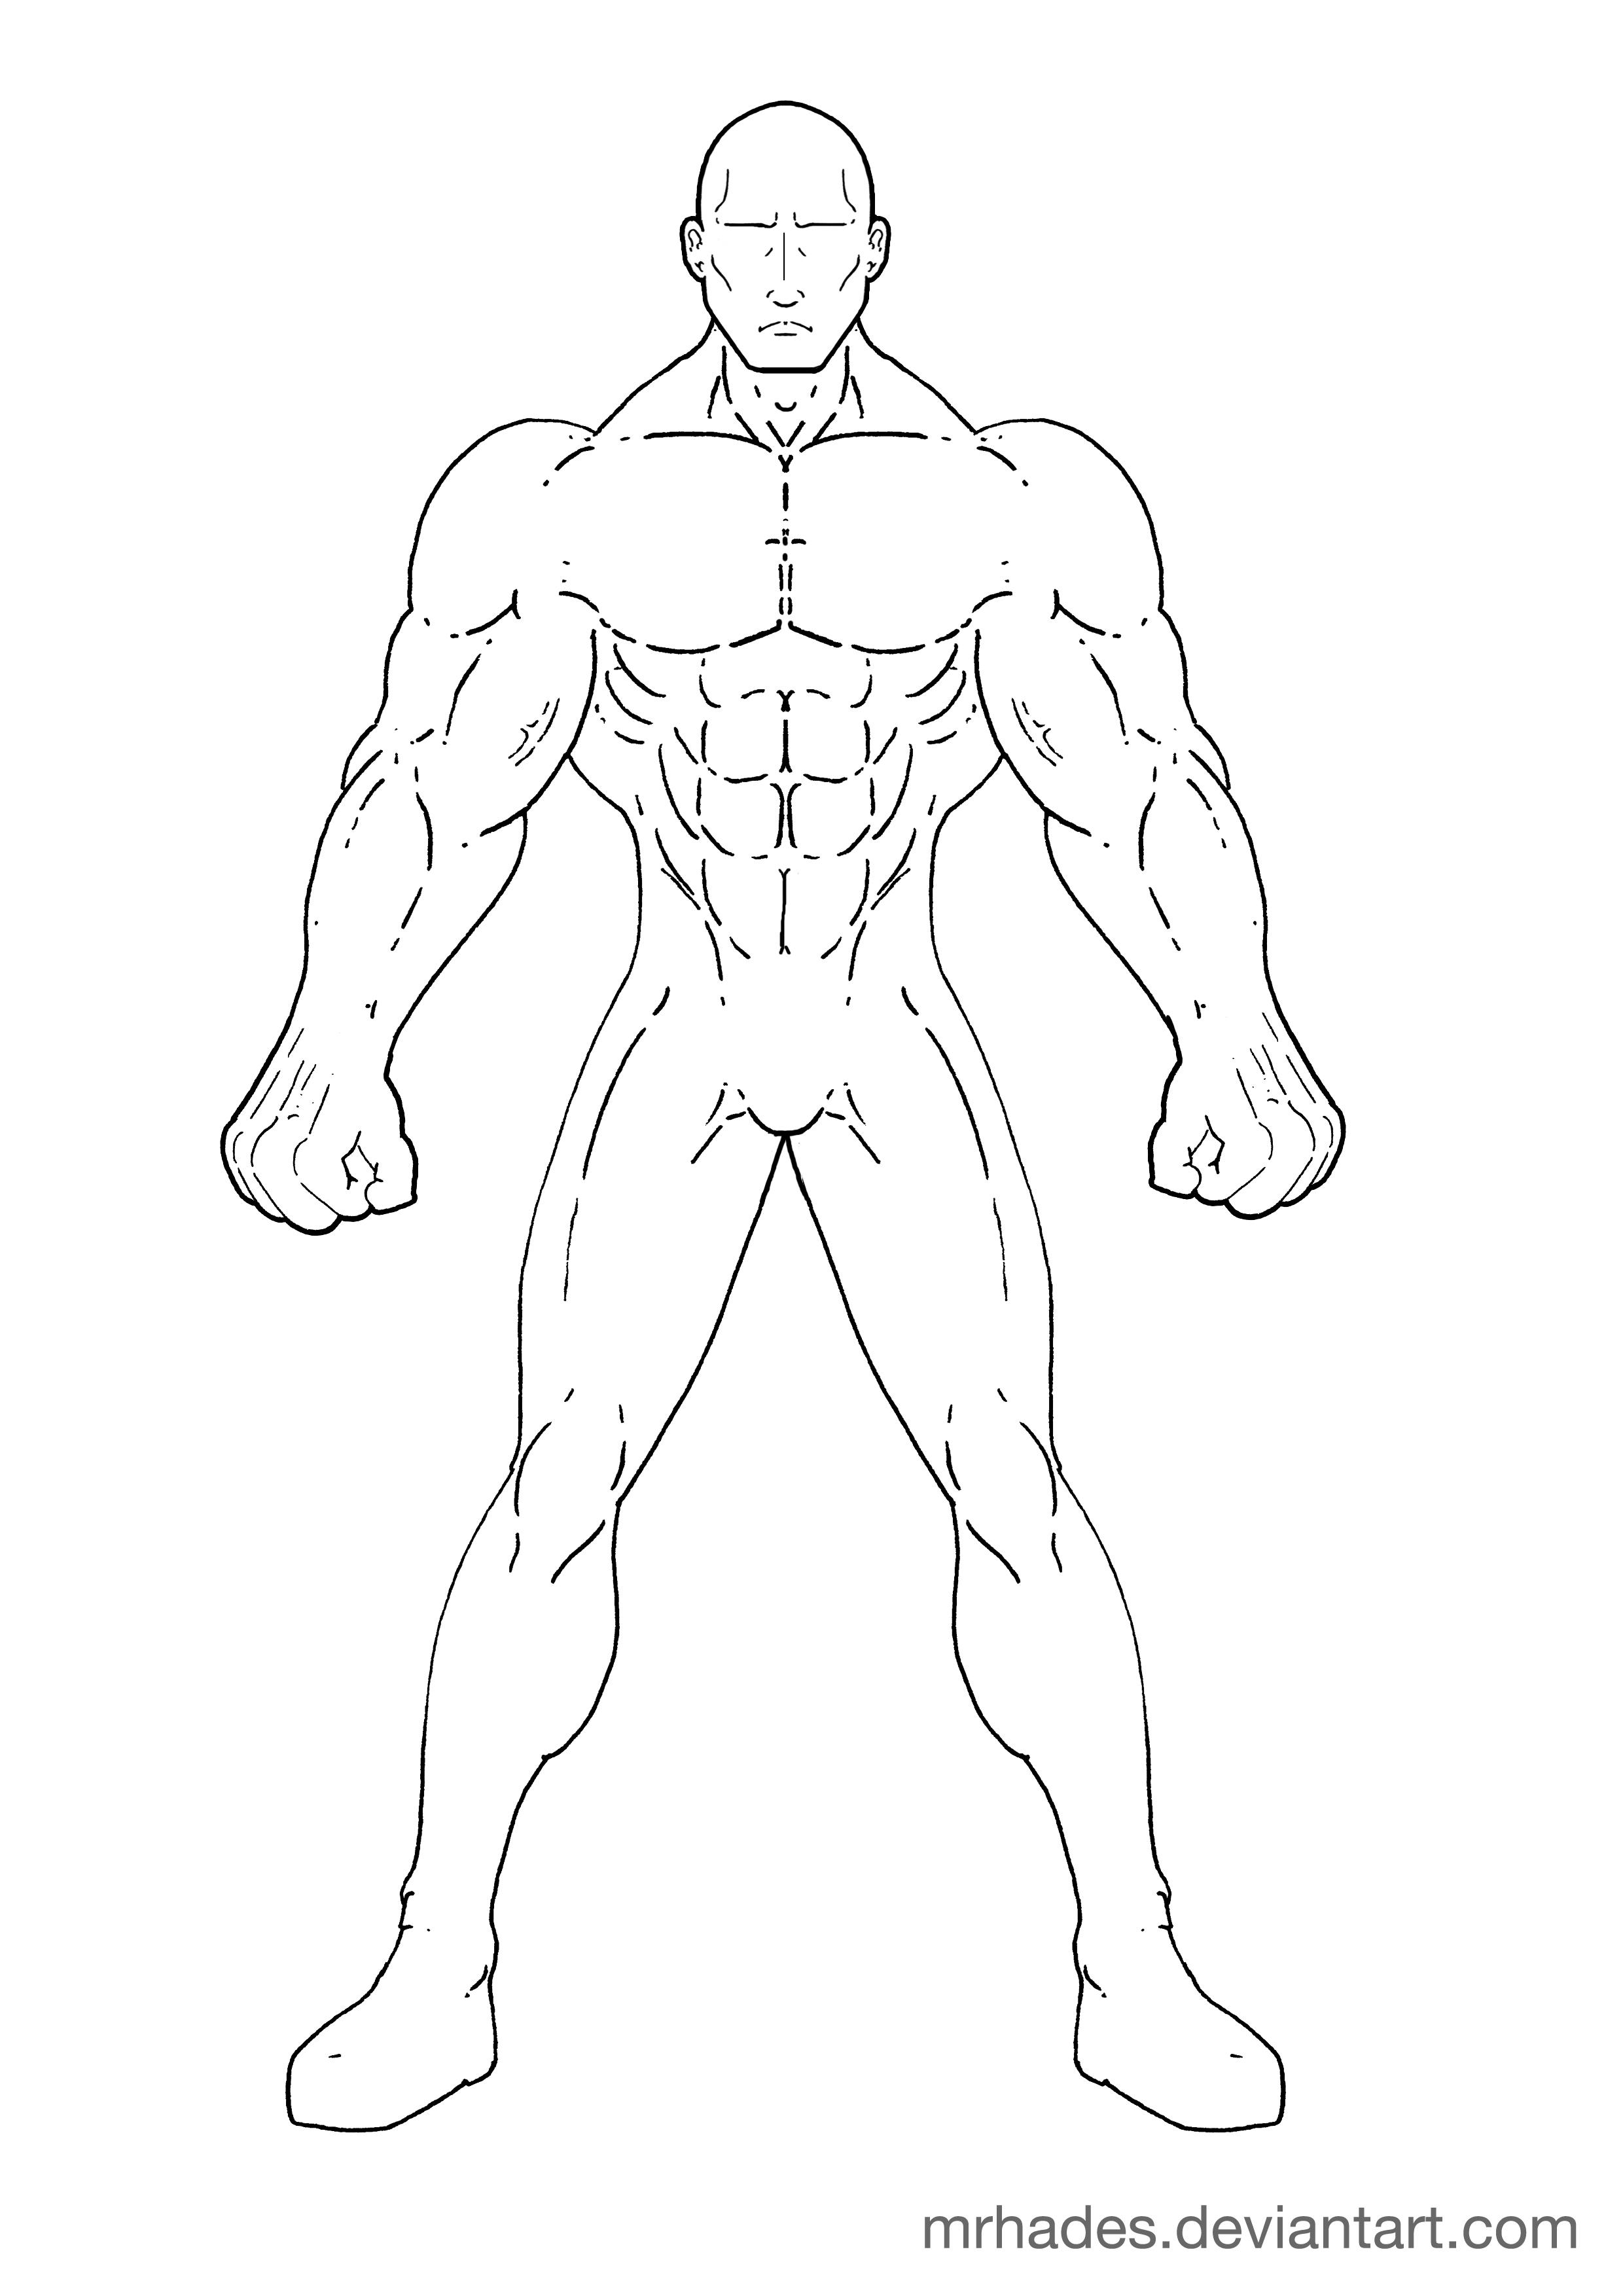 Draw your own SUPERHERO!